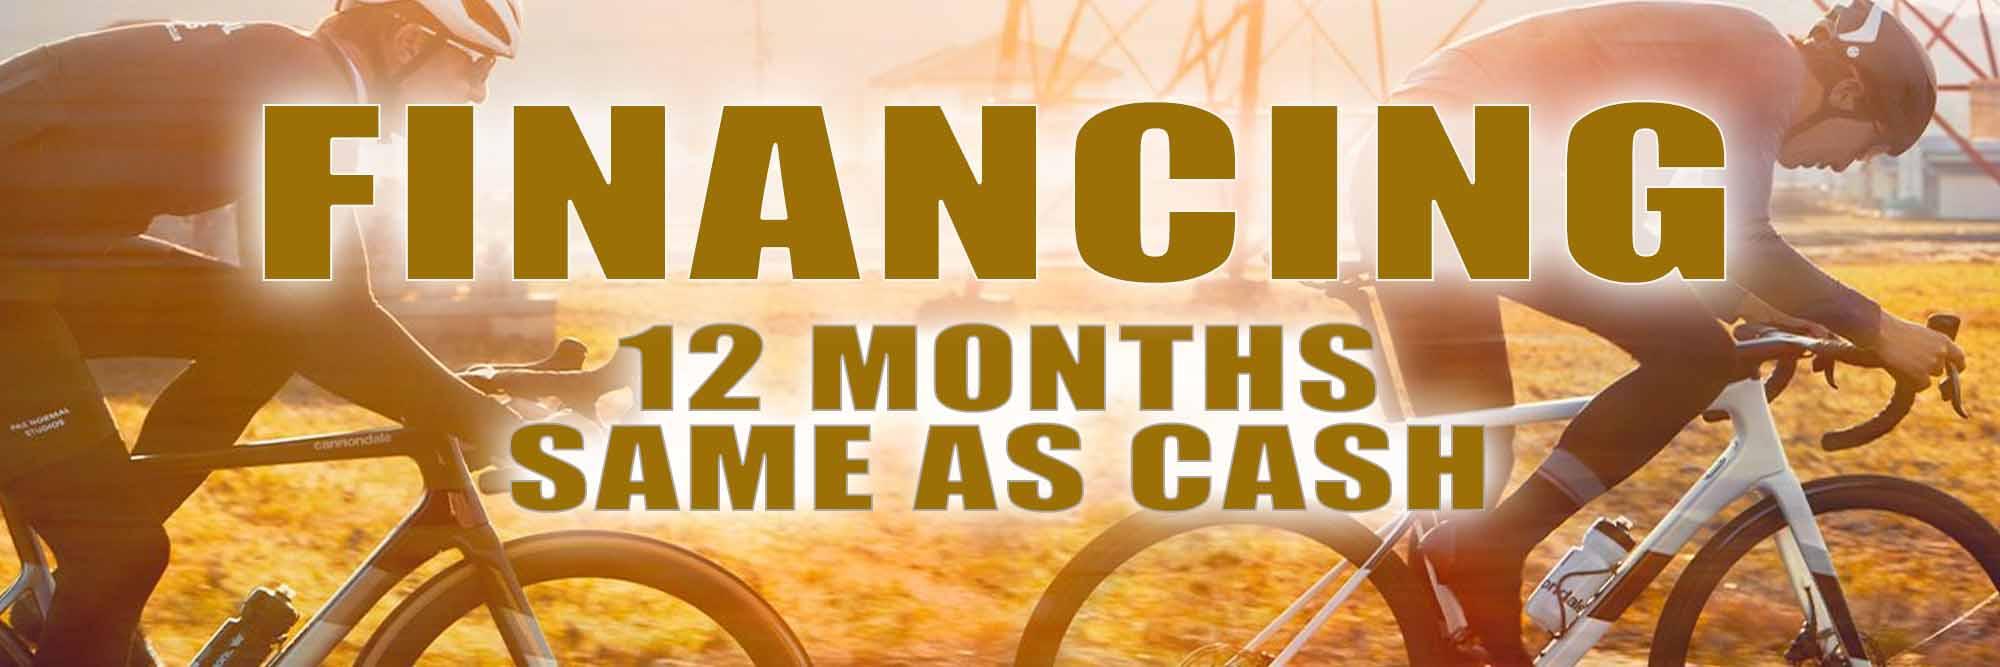 Finance - 12 Months Same as Cash